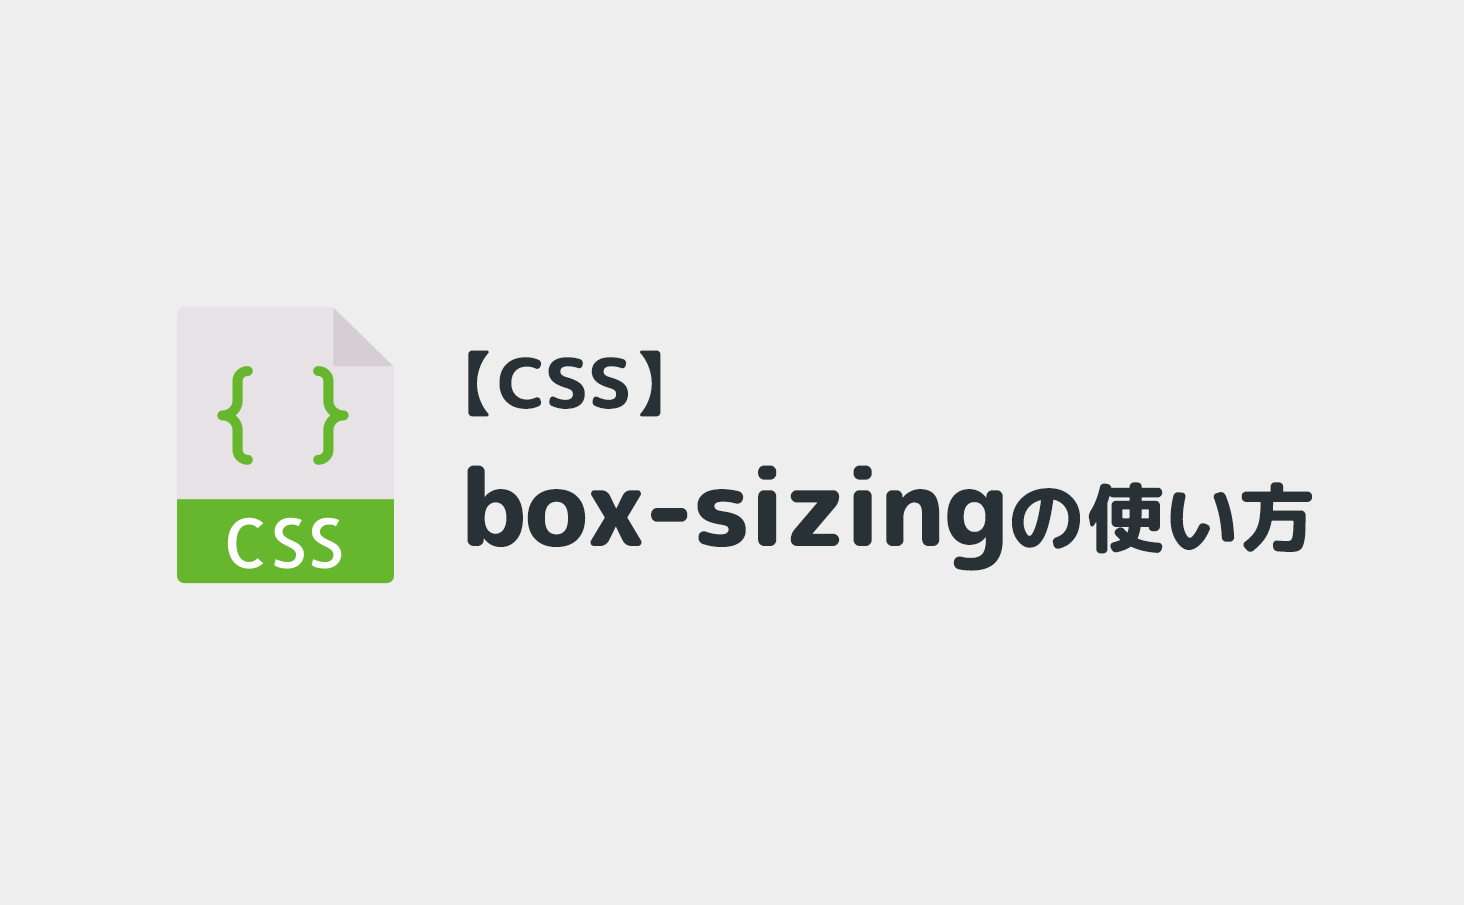 box-sizingの使い方